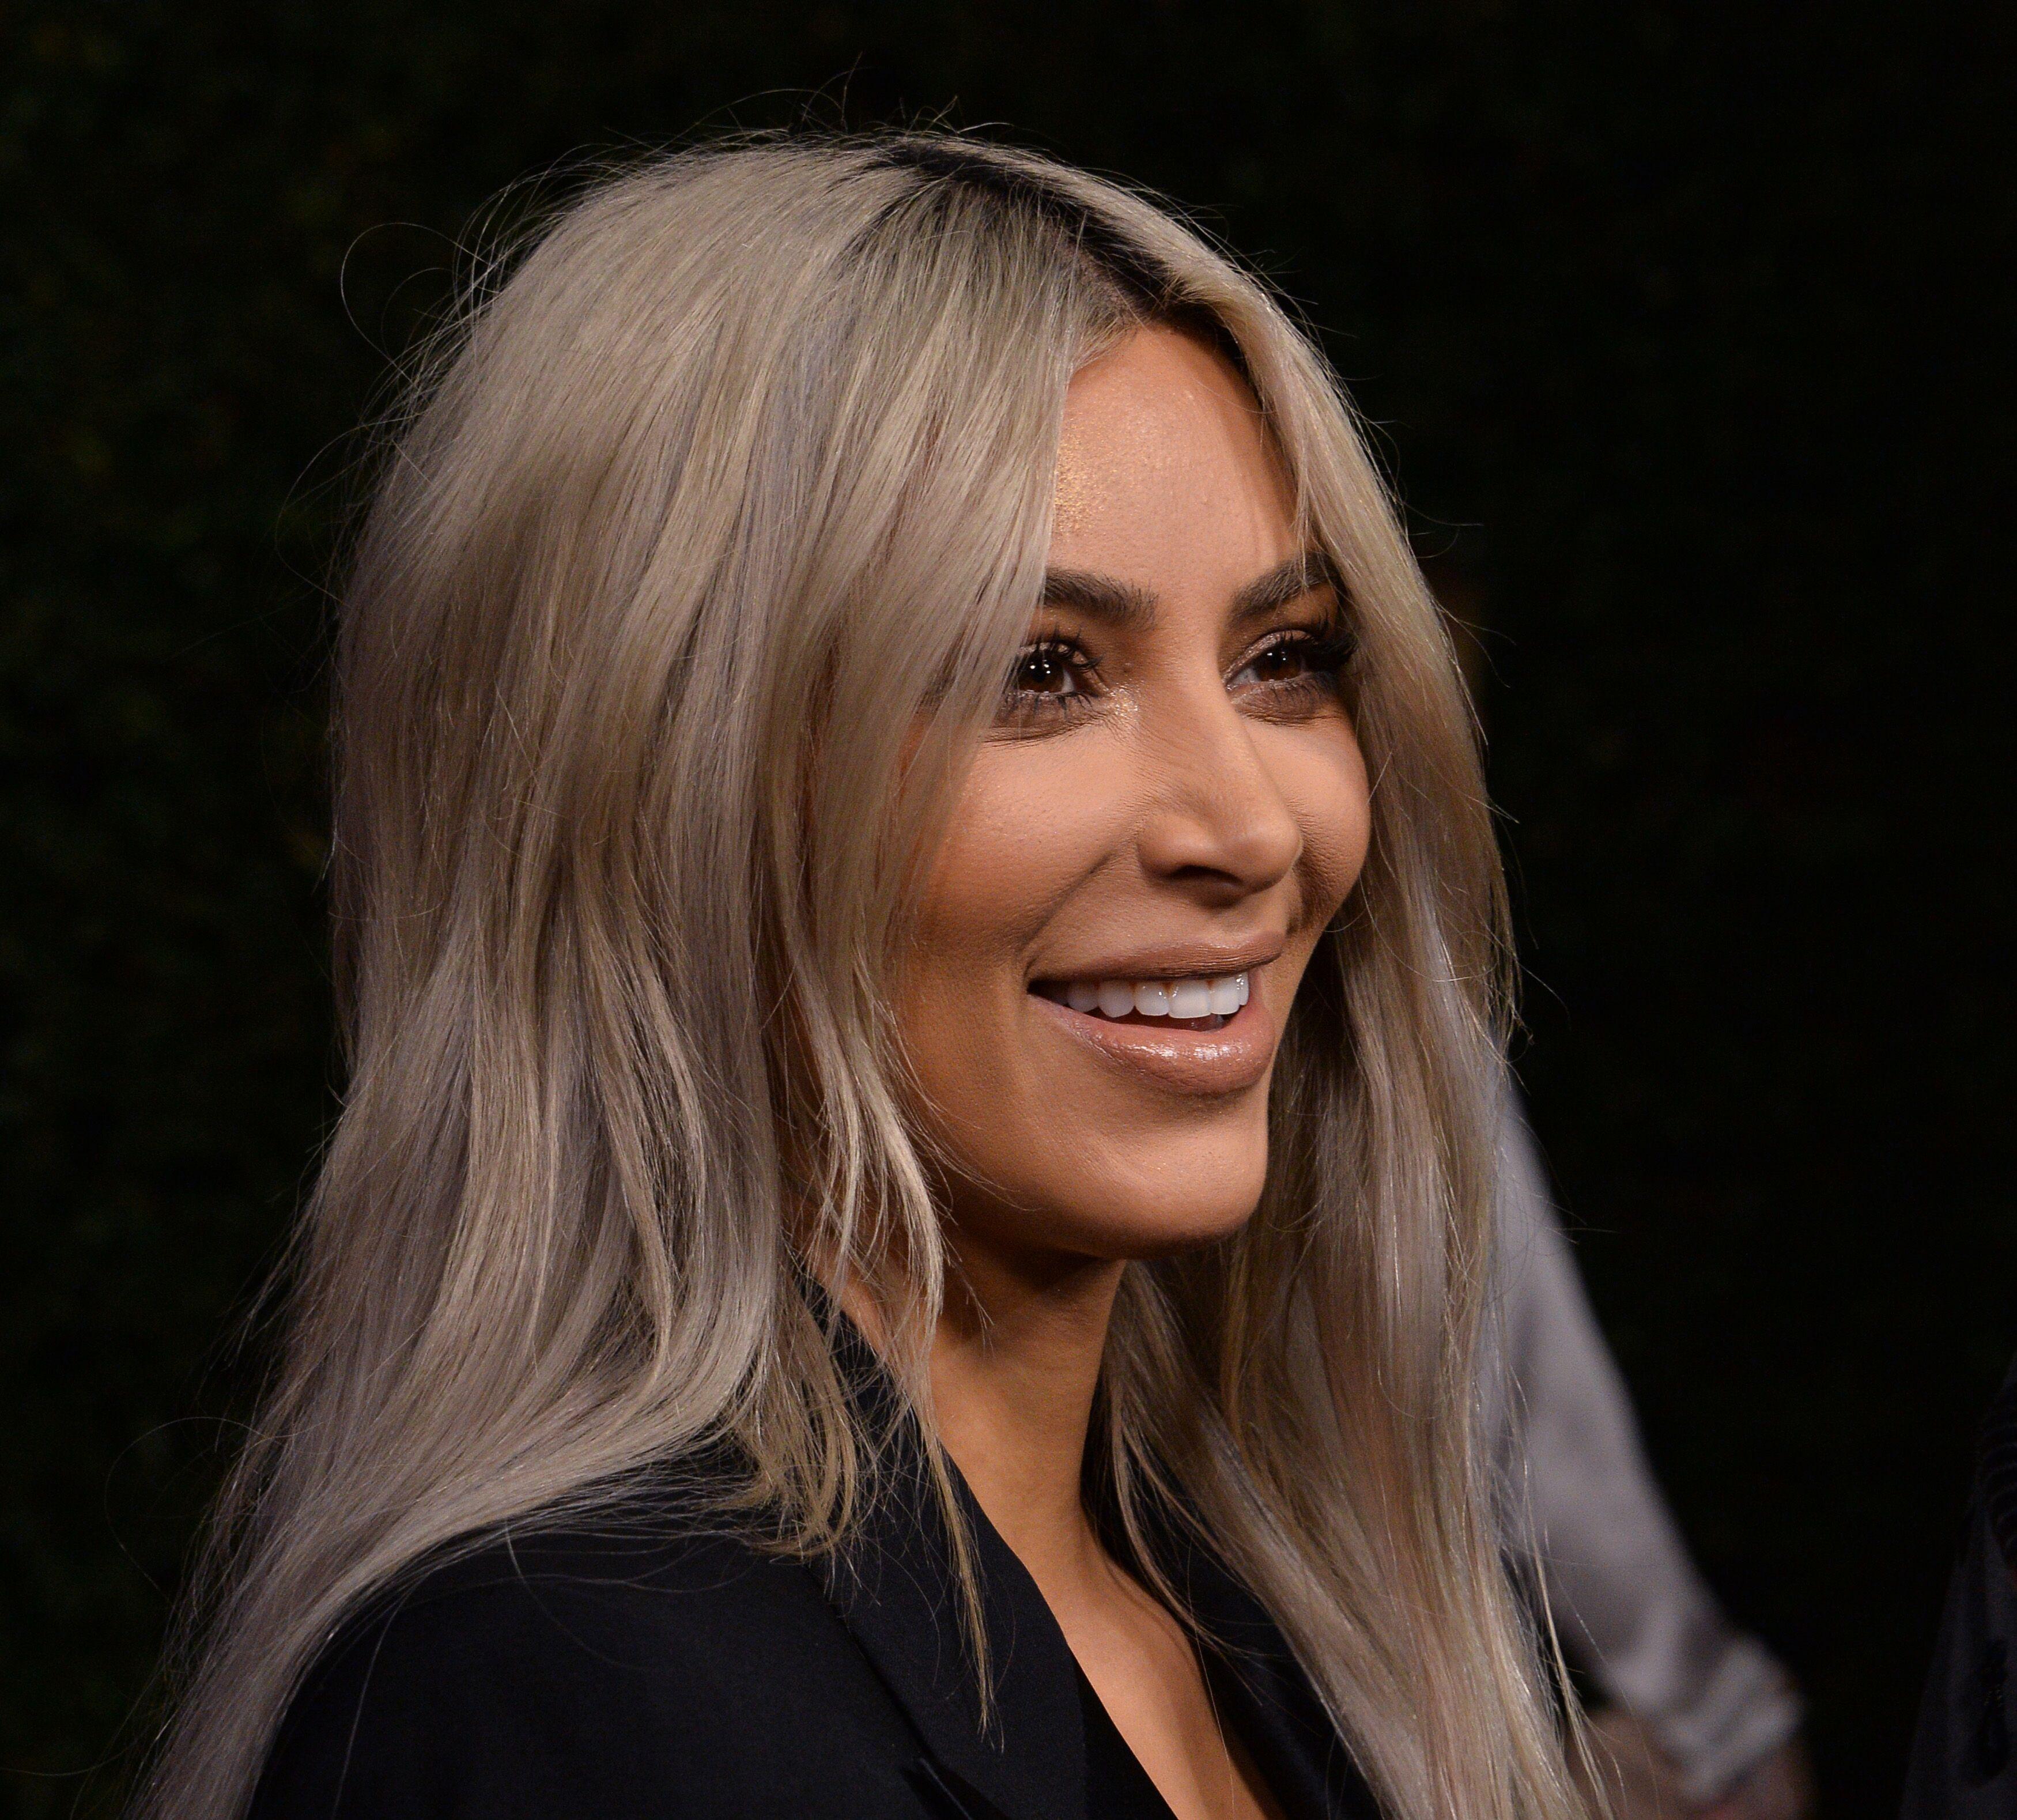 73e3429c5a22e Kim Kardashian dévoile enfin le prénom de sa petite fille - Voici